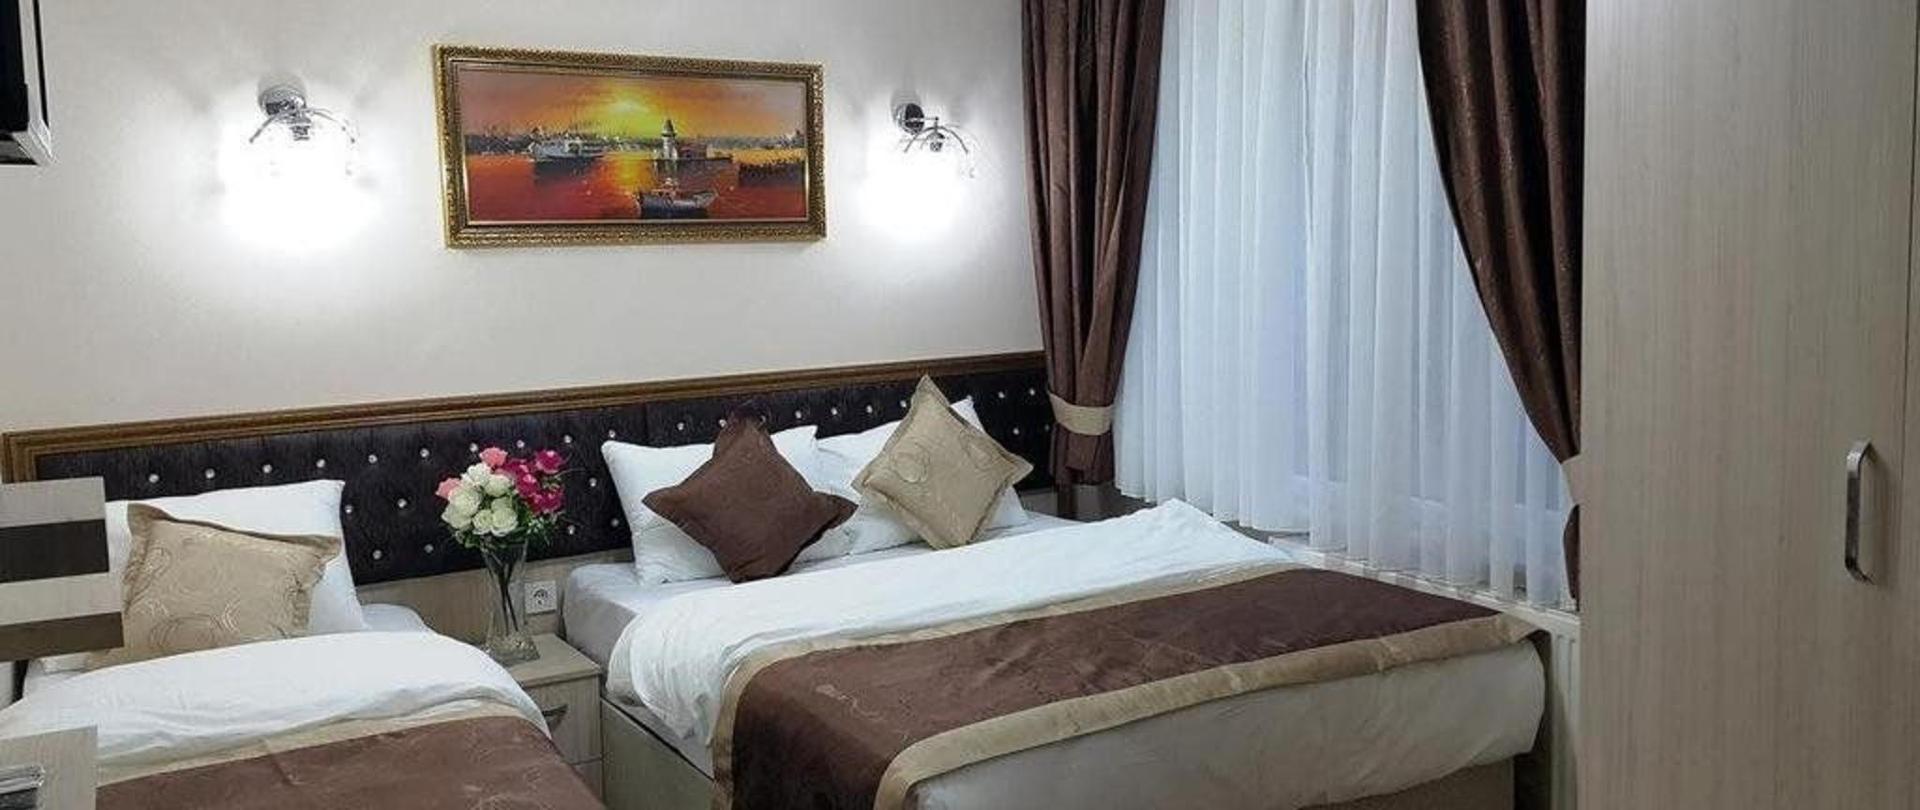 Beyazithan suites istanbul turkey for Beyazit han suites